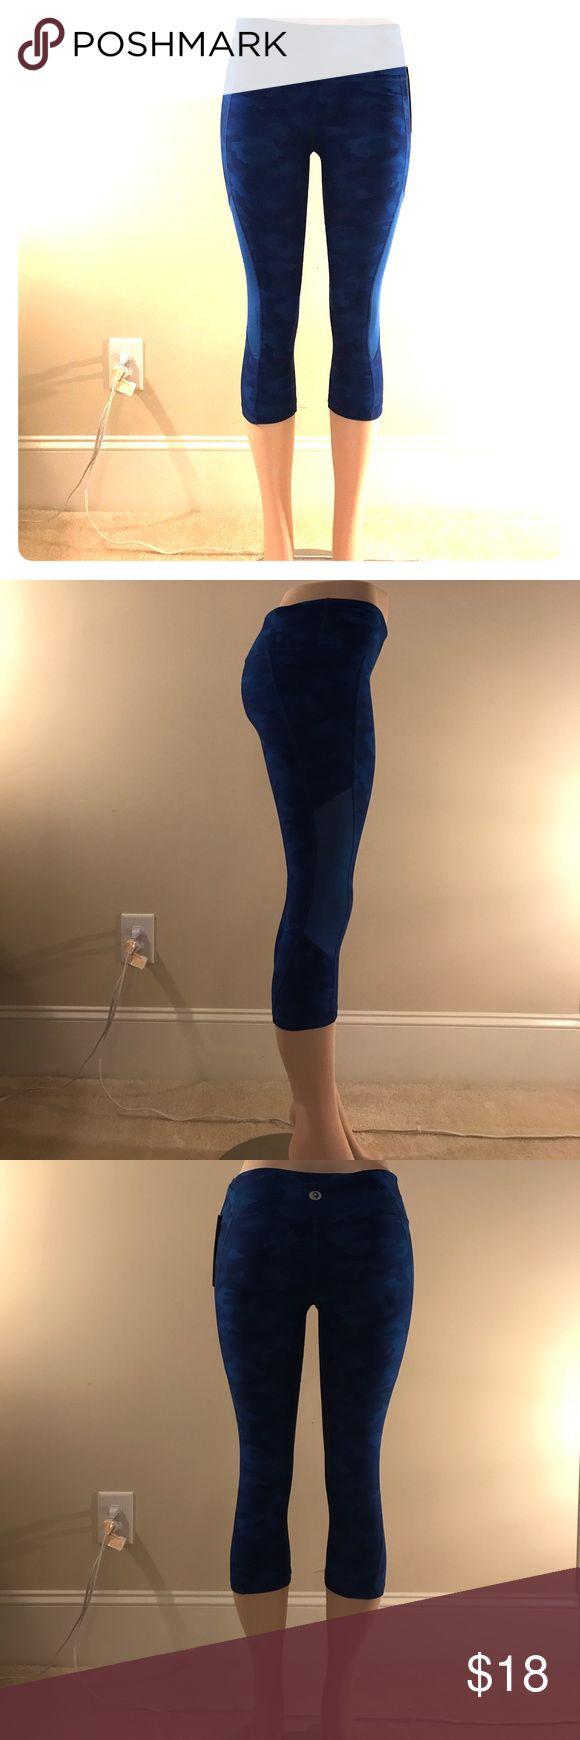 NWT Scorpio Soul blue camo yoga pants Blue camo, just below the knee yoga pants with optimum stretch and moisture management Scorpio Sol Pants Leggings